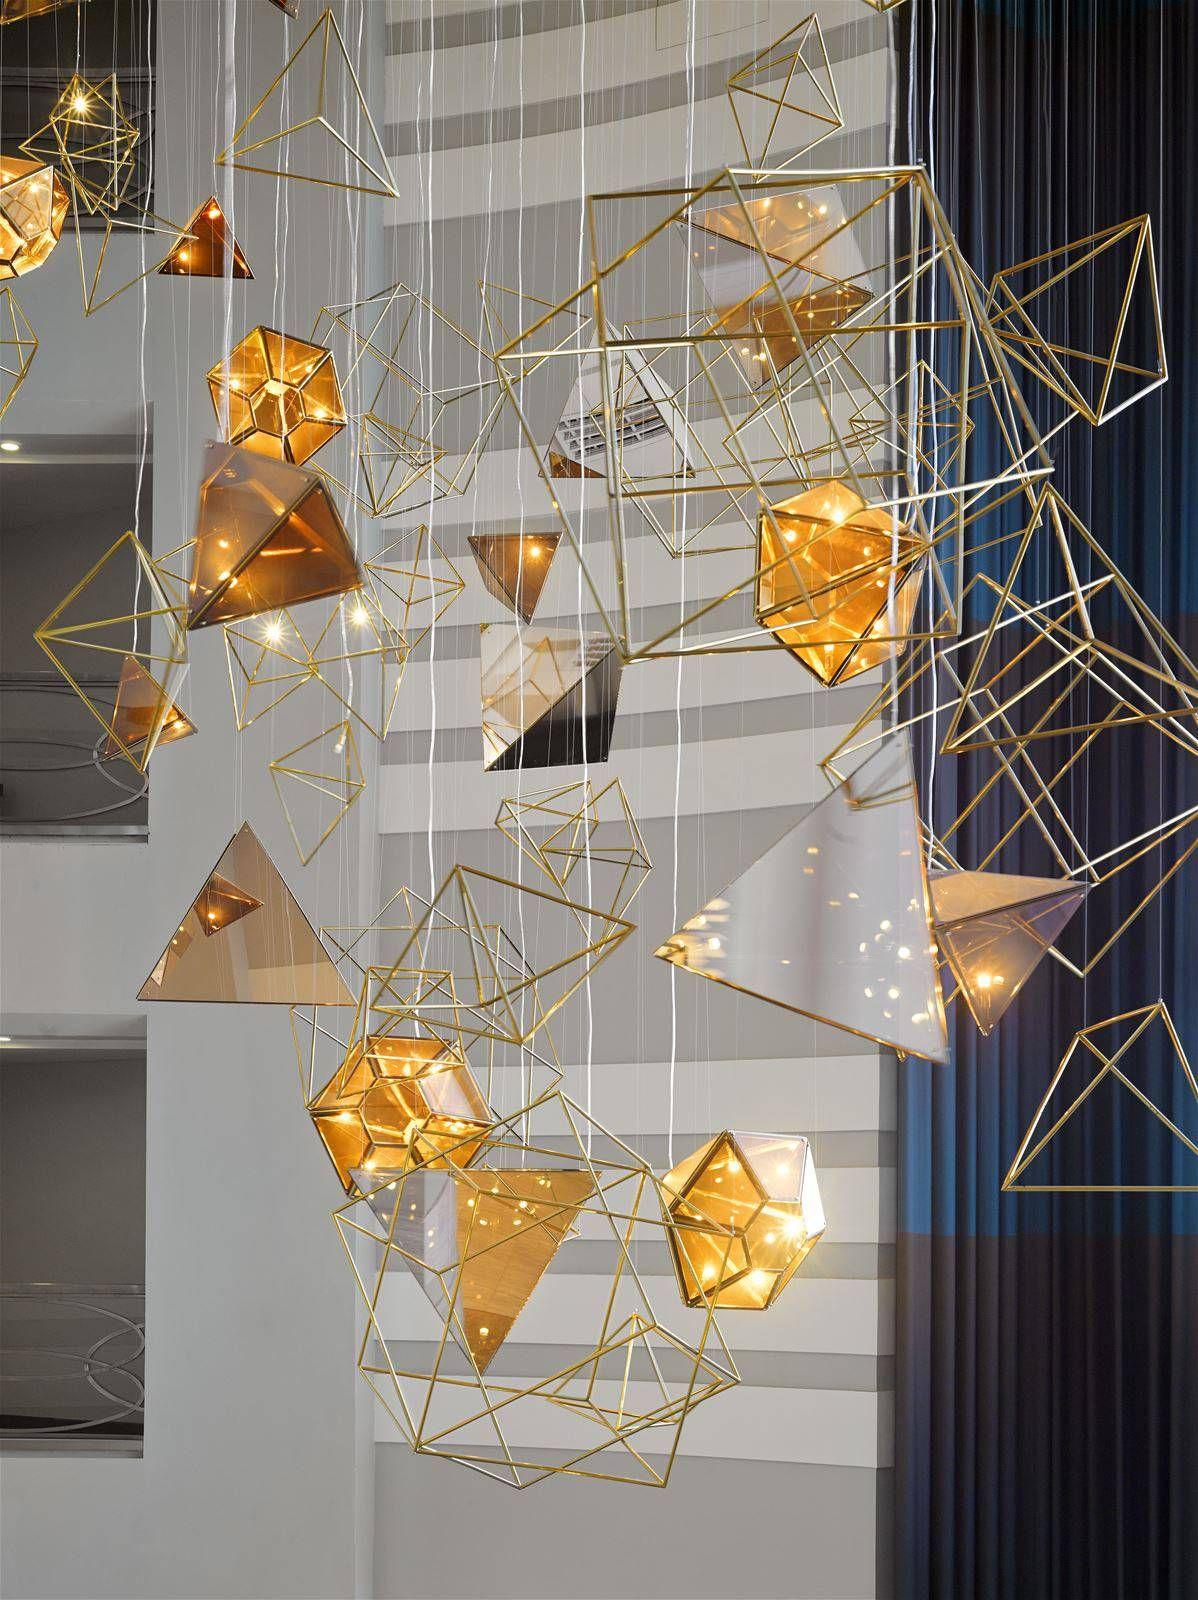 Preciosa Lighting is an innovative company which creates